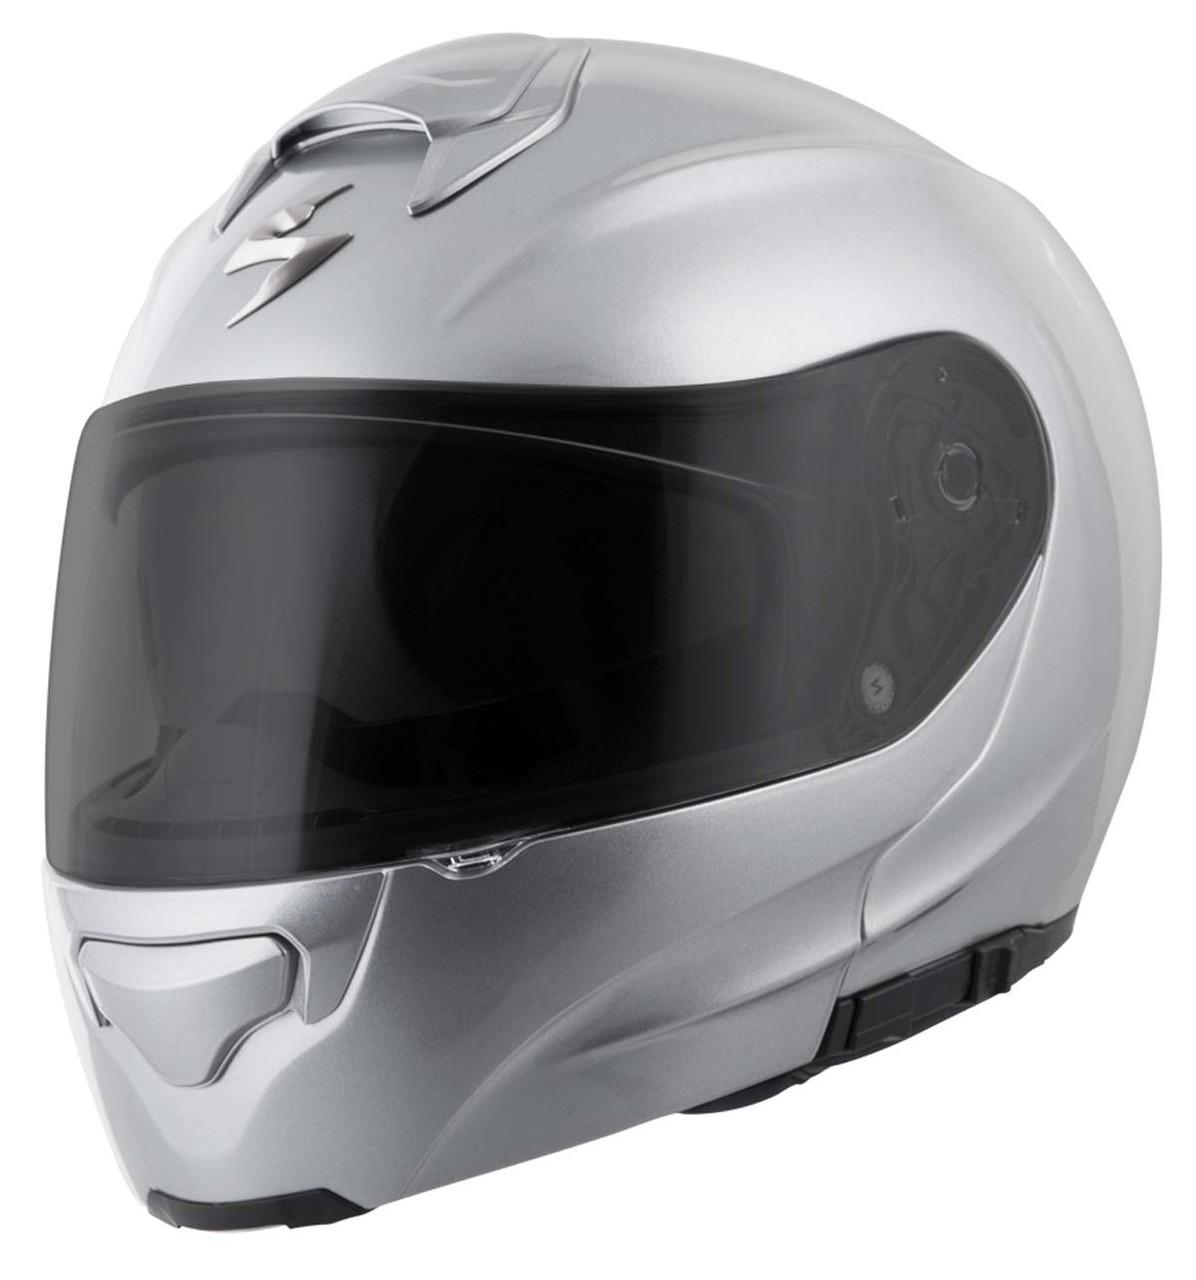 scorpion exo gt3000 solid helmet. Black Bedroom Furniture Sets. Home Design Ideas